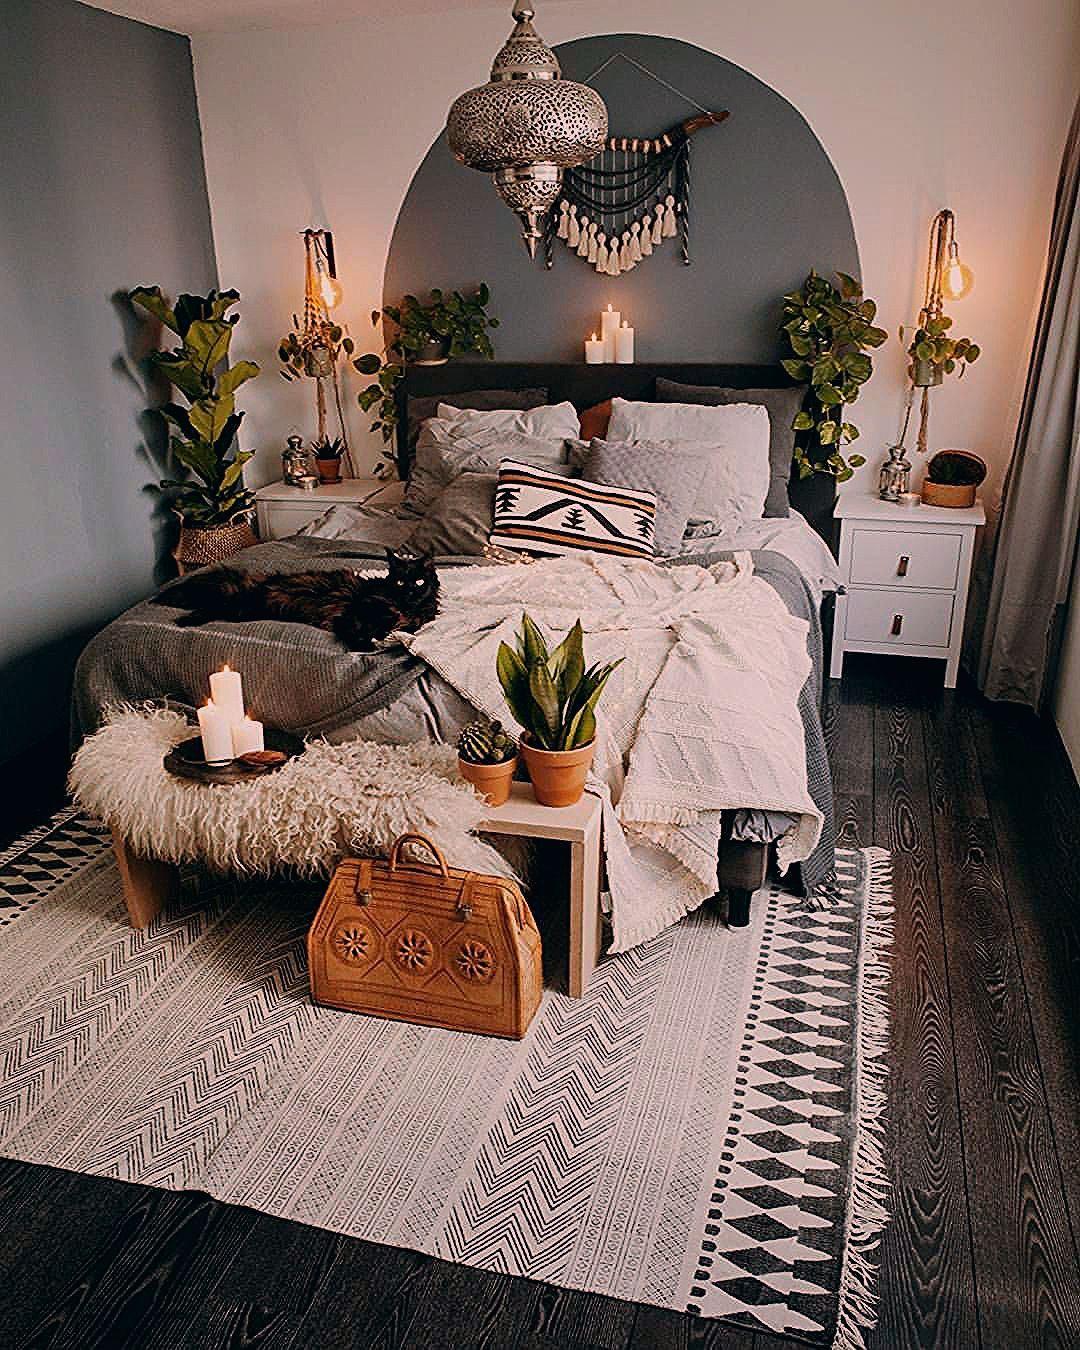 Minimalist Boho Bedroom - Interior Design Ideas & Home Decorating Inspiration - moercar